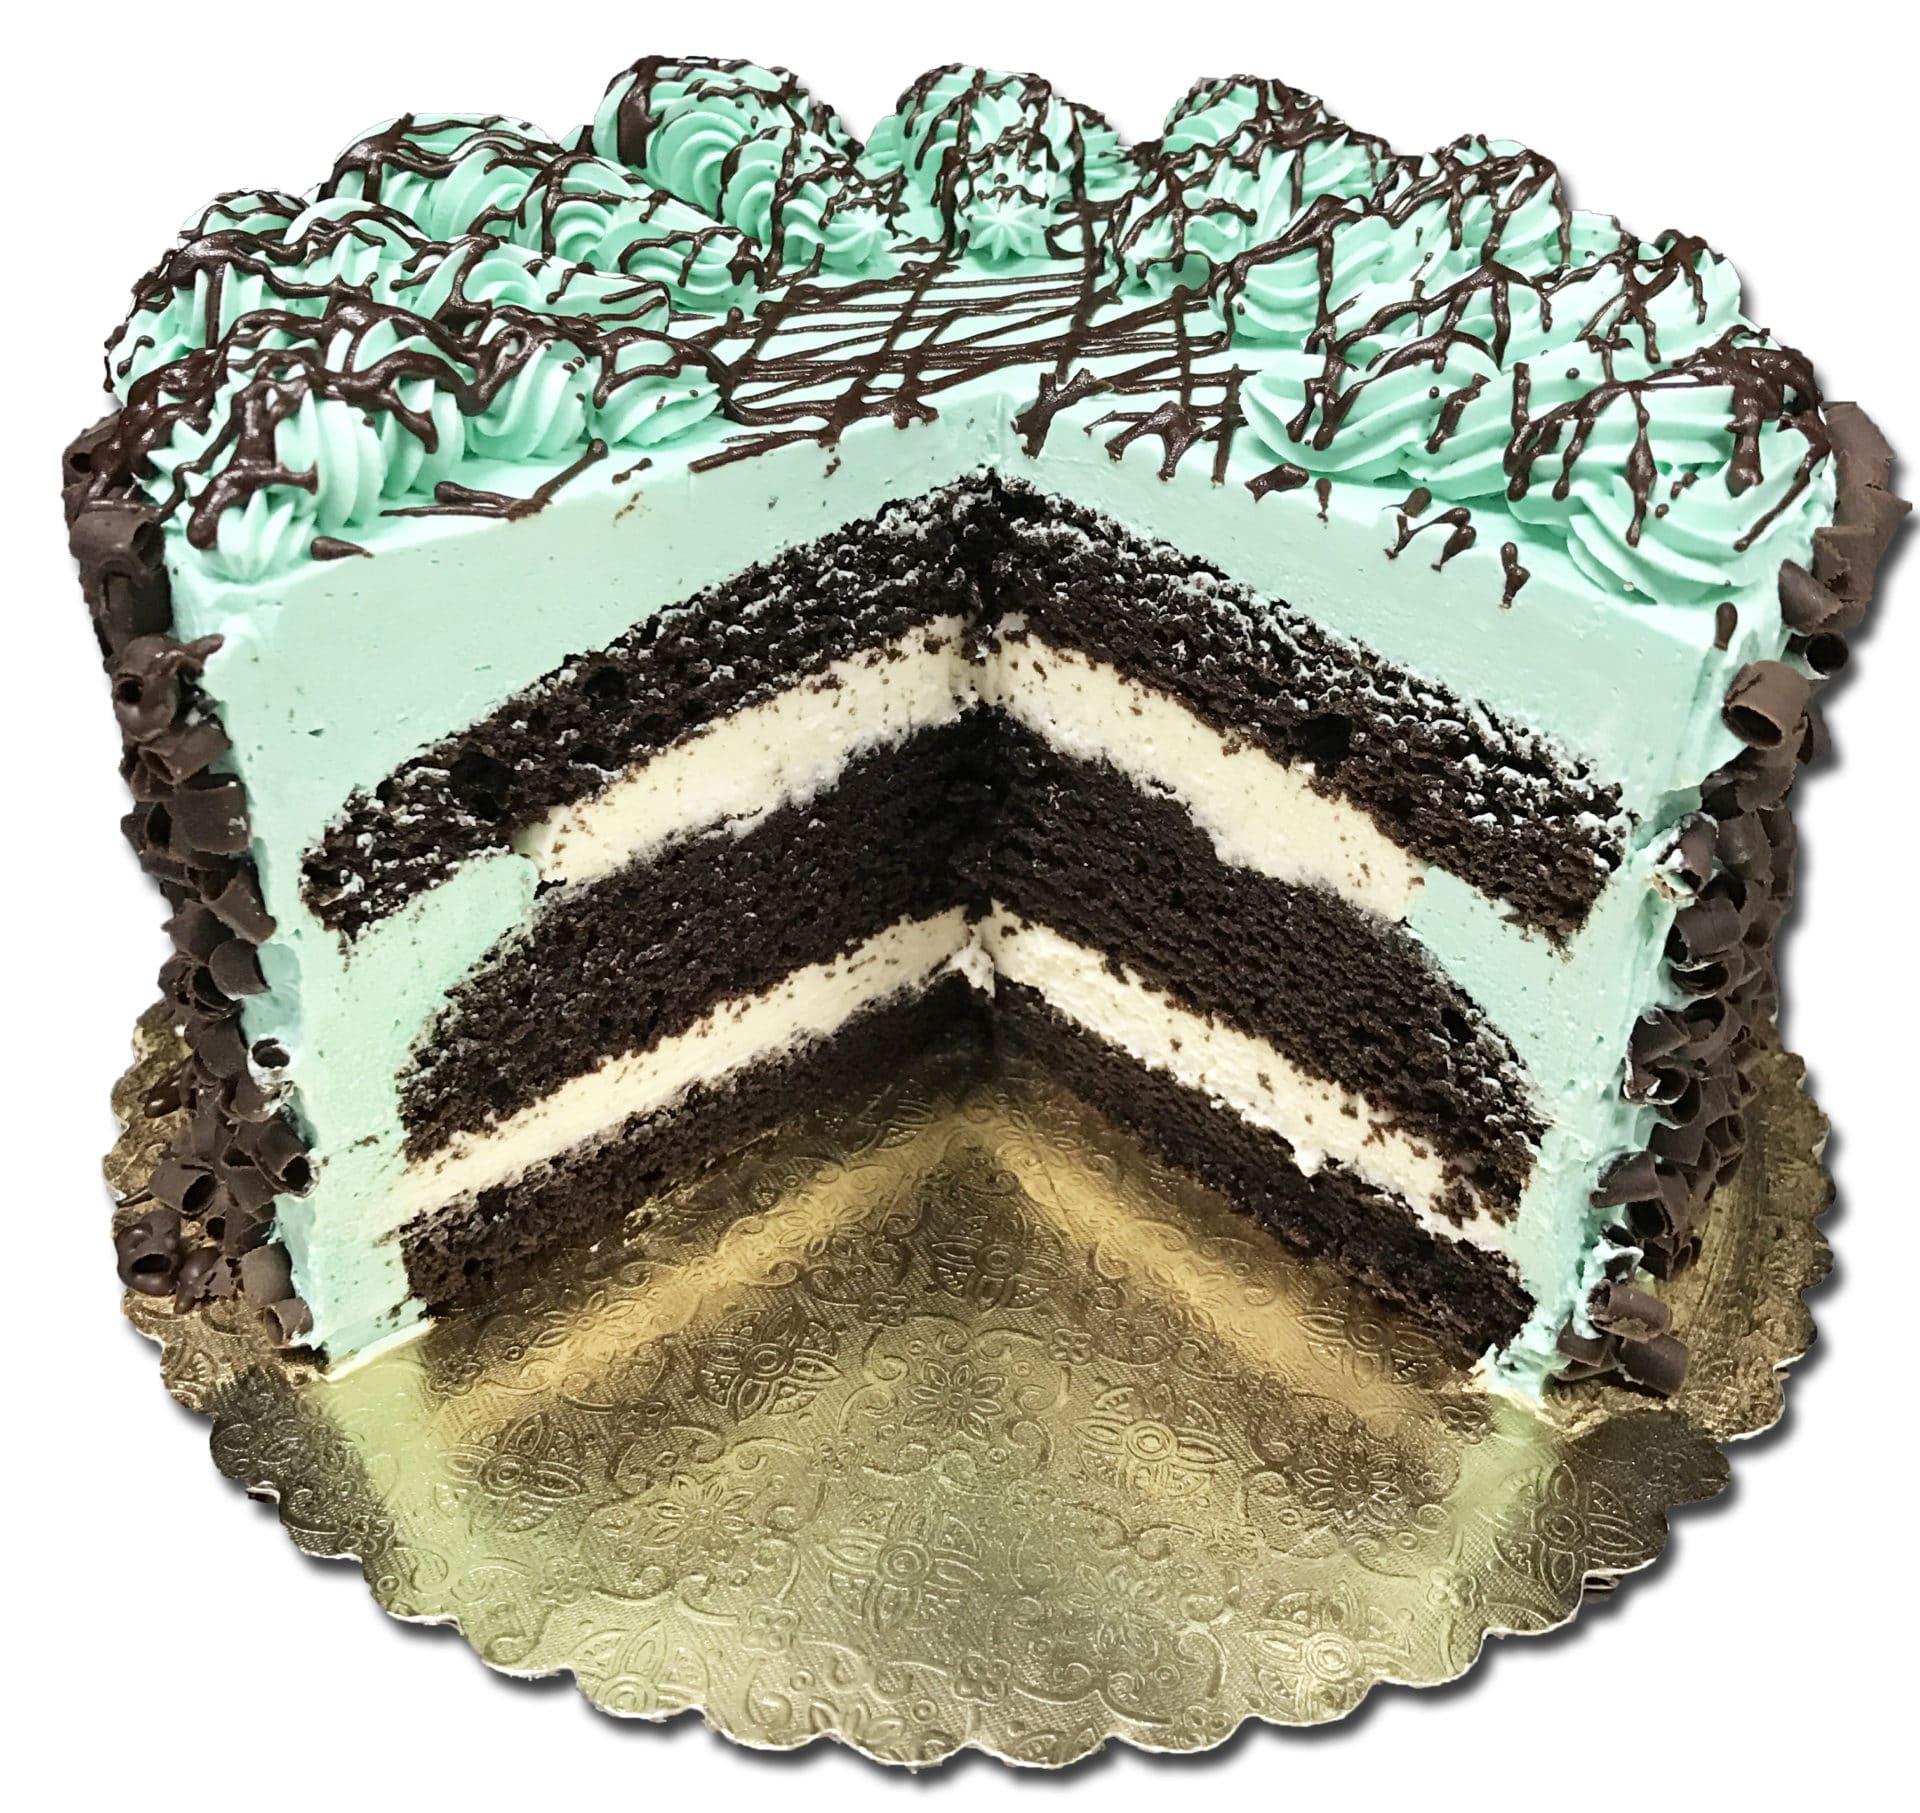 Aggies Chocolate Mint Torte